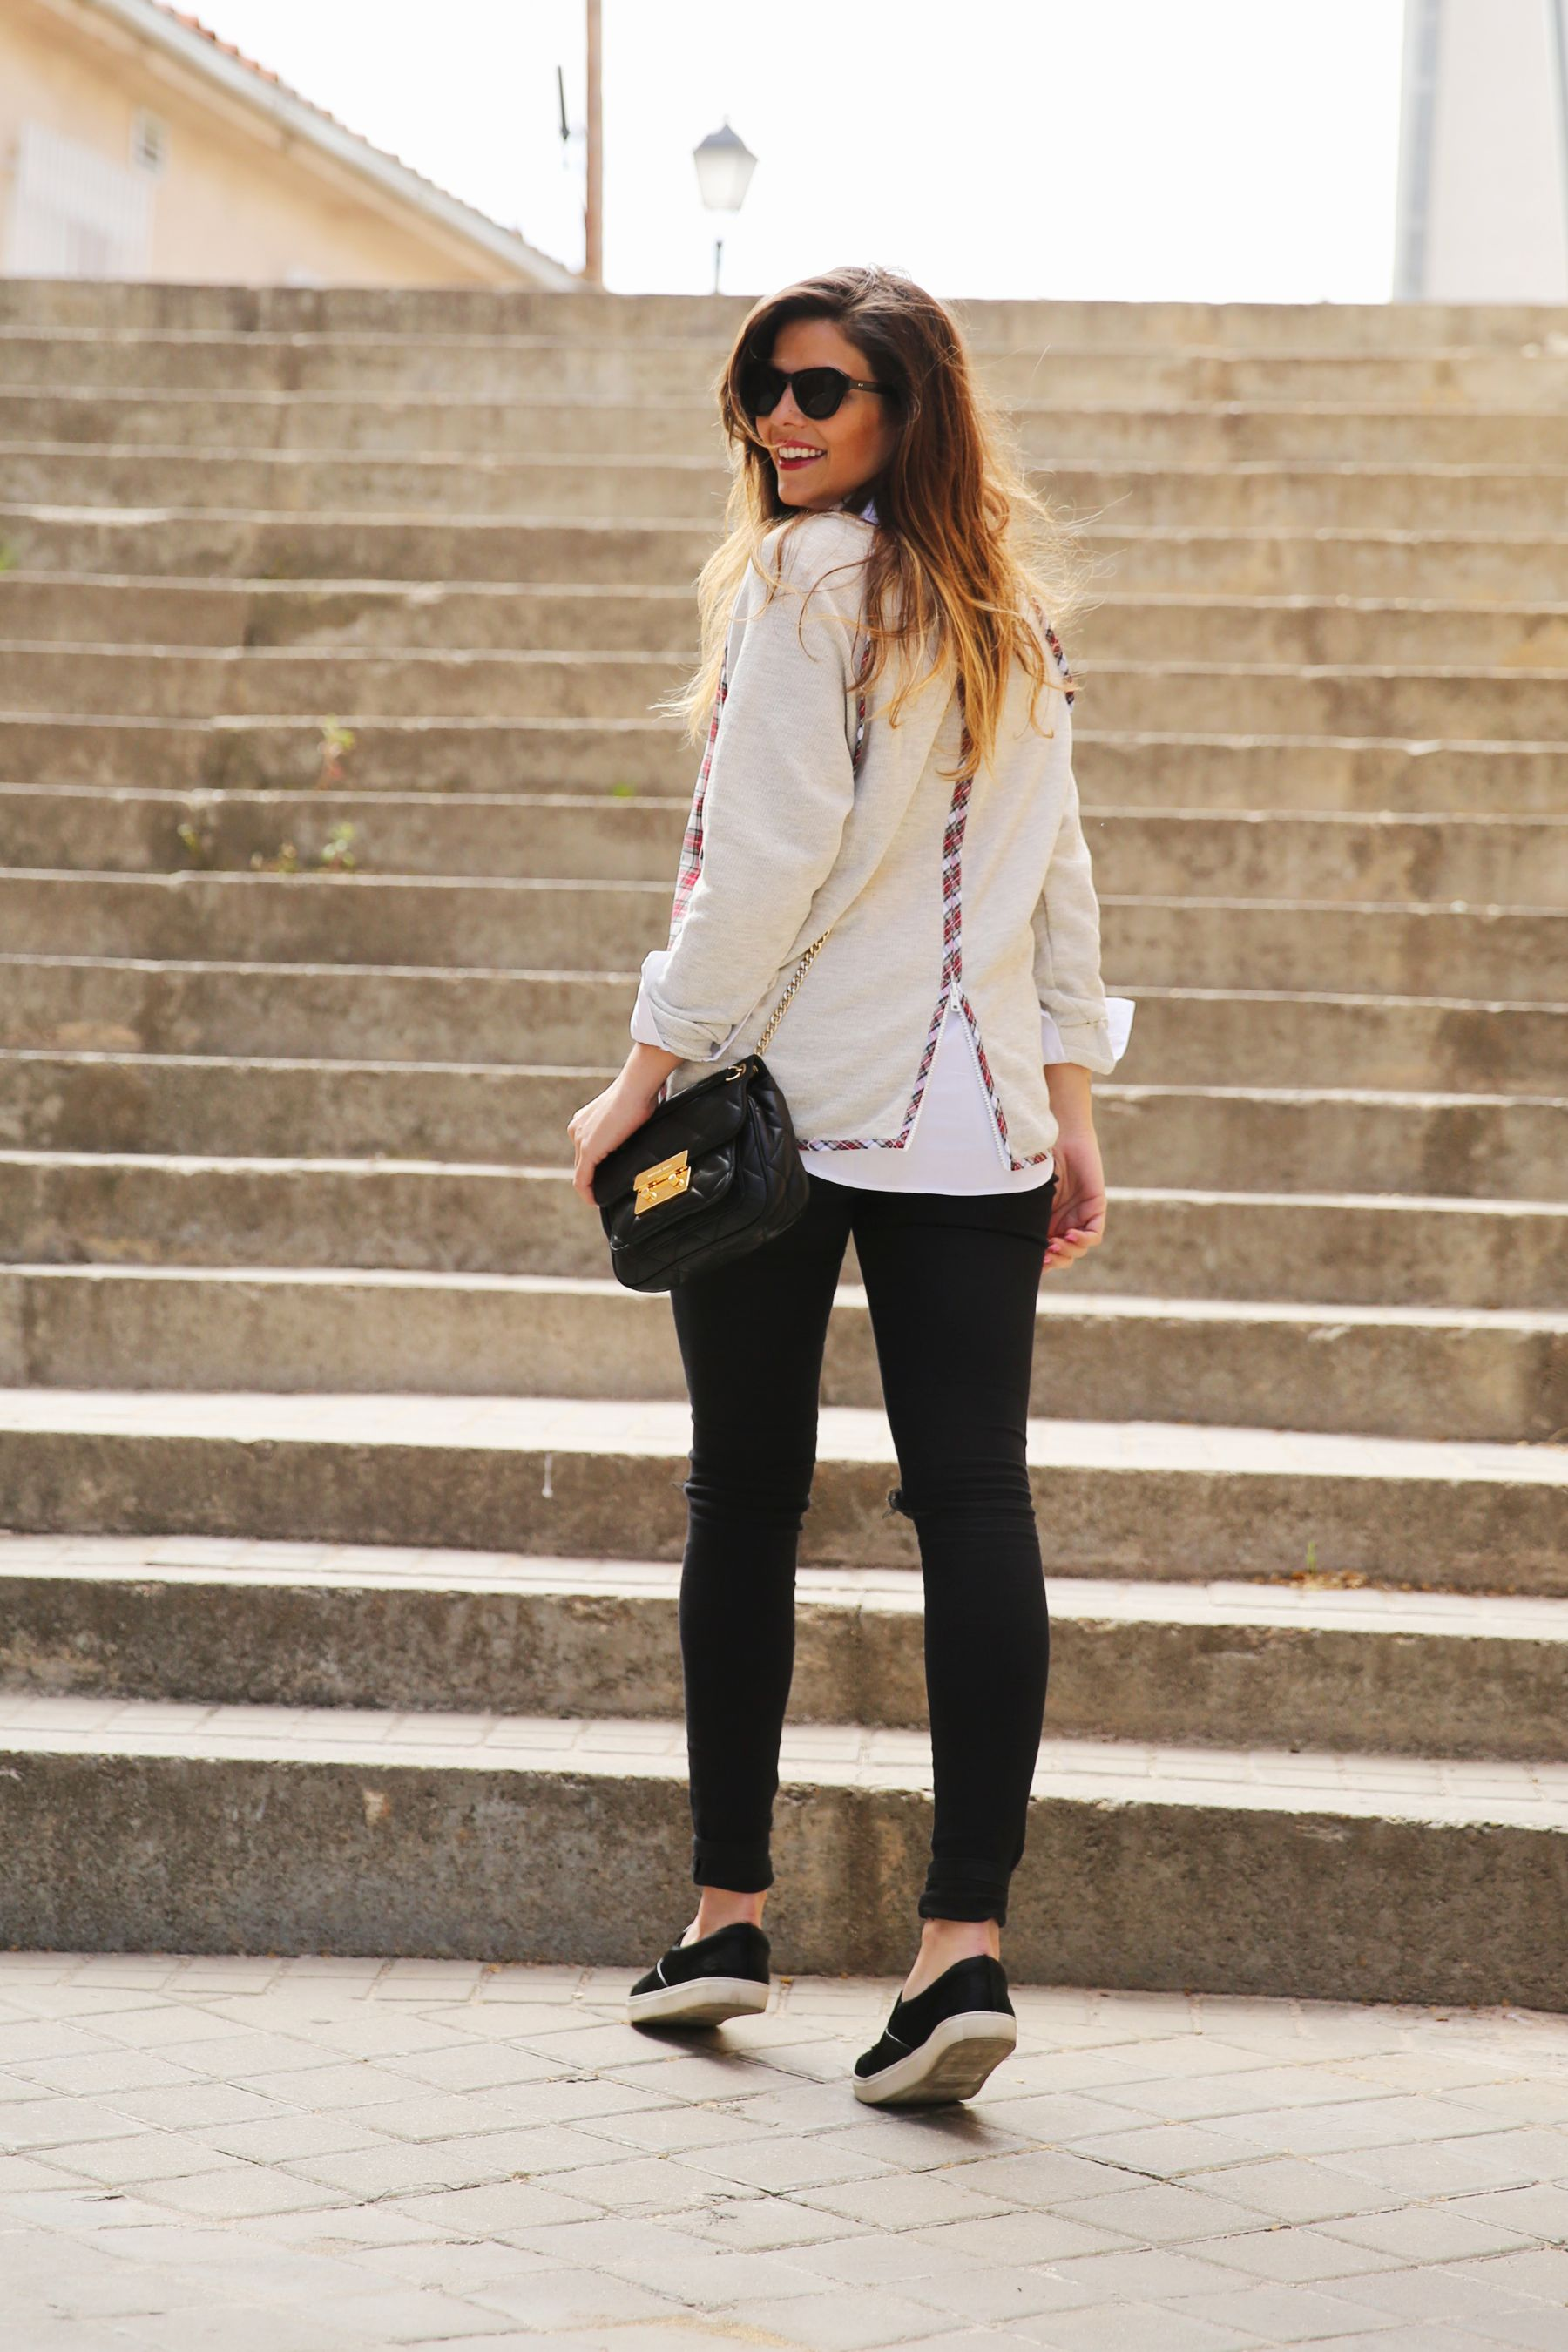 trendy_taste-look-outfit-street_style-ootd-blog-blogger-fashion-spain-moda-españa-steve-madden-plaid-shirt-camisa-cuadros-skinny-jeans-pitillos-negros-2